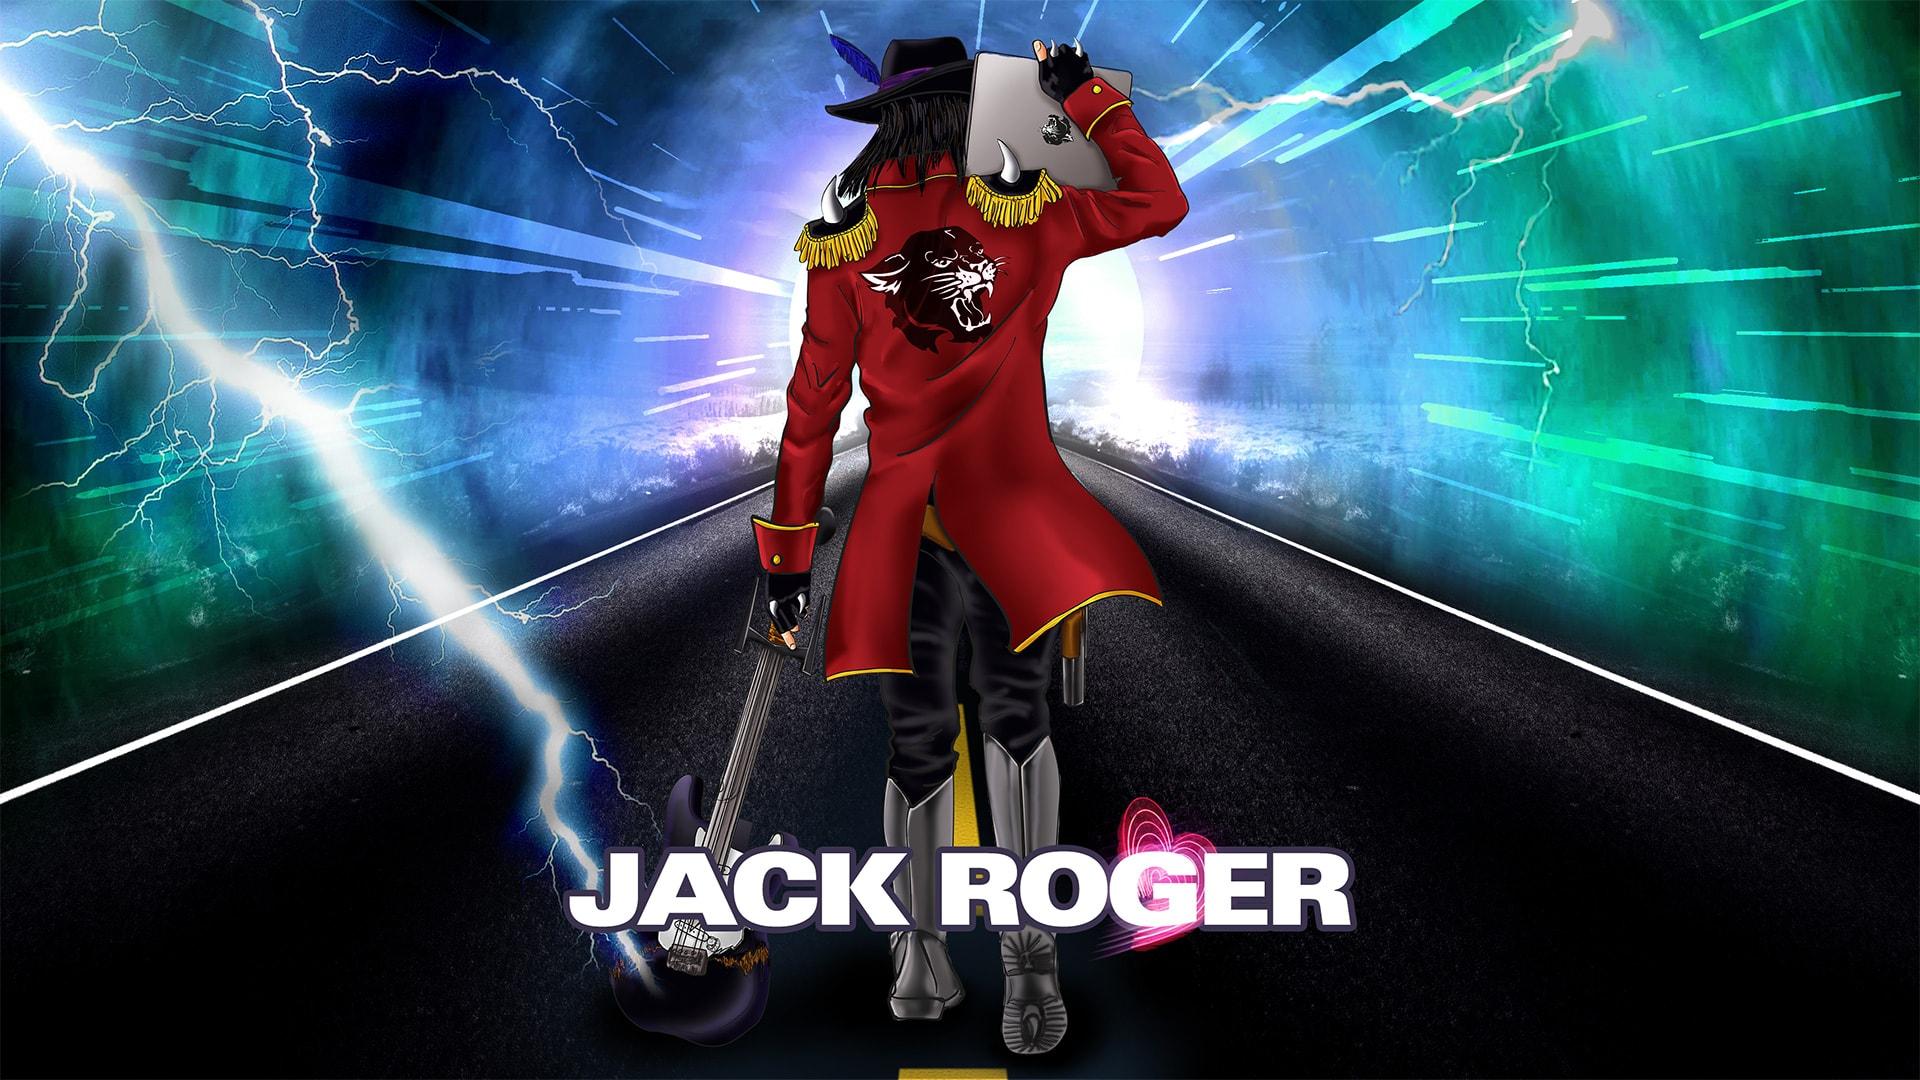 01-Jack-Roger-widescreen